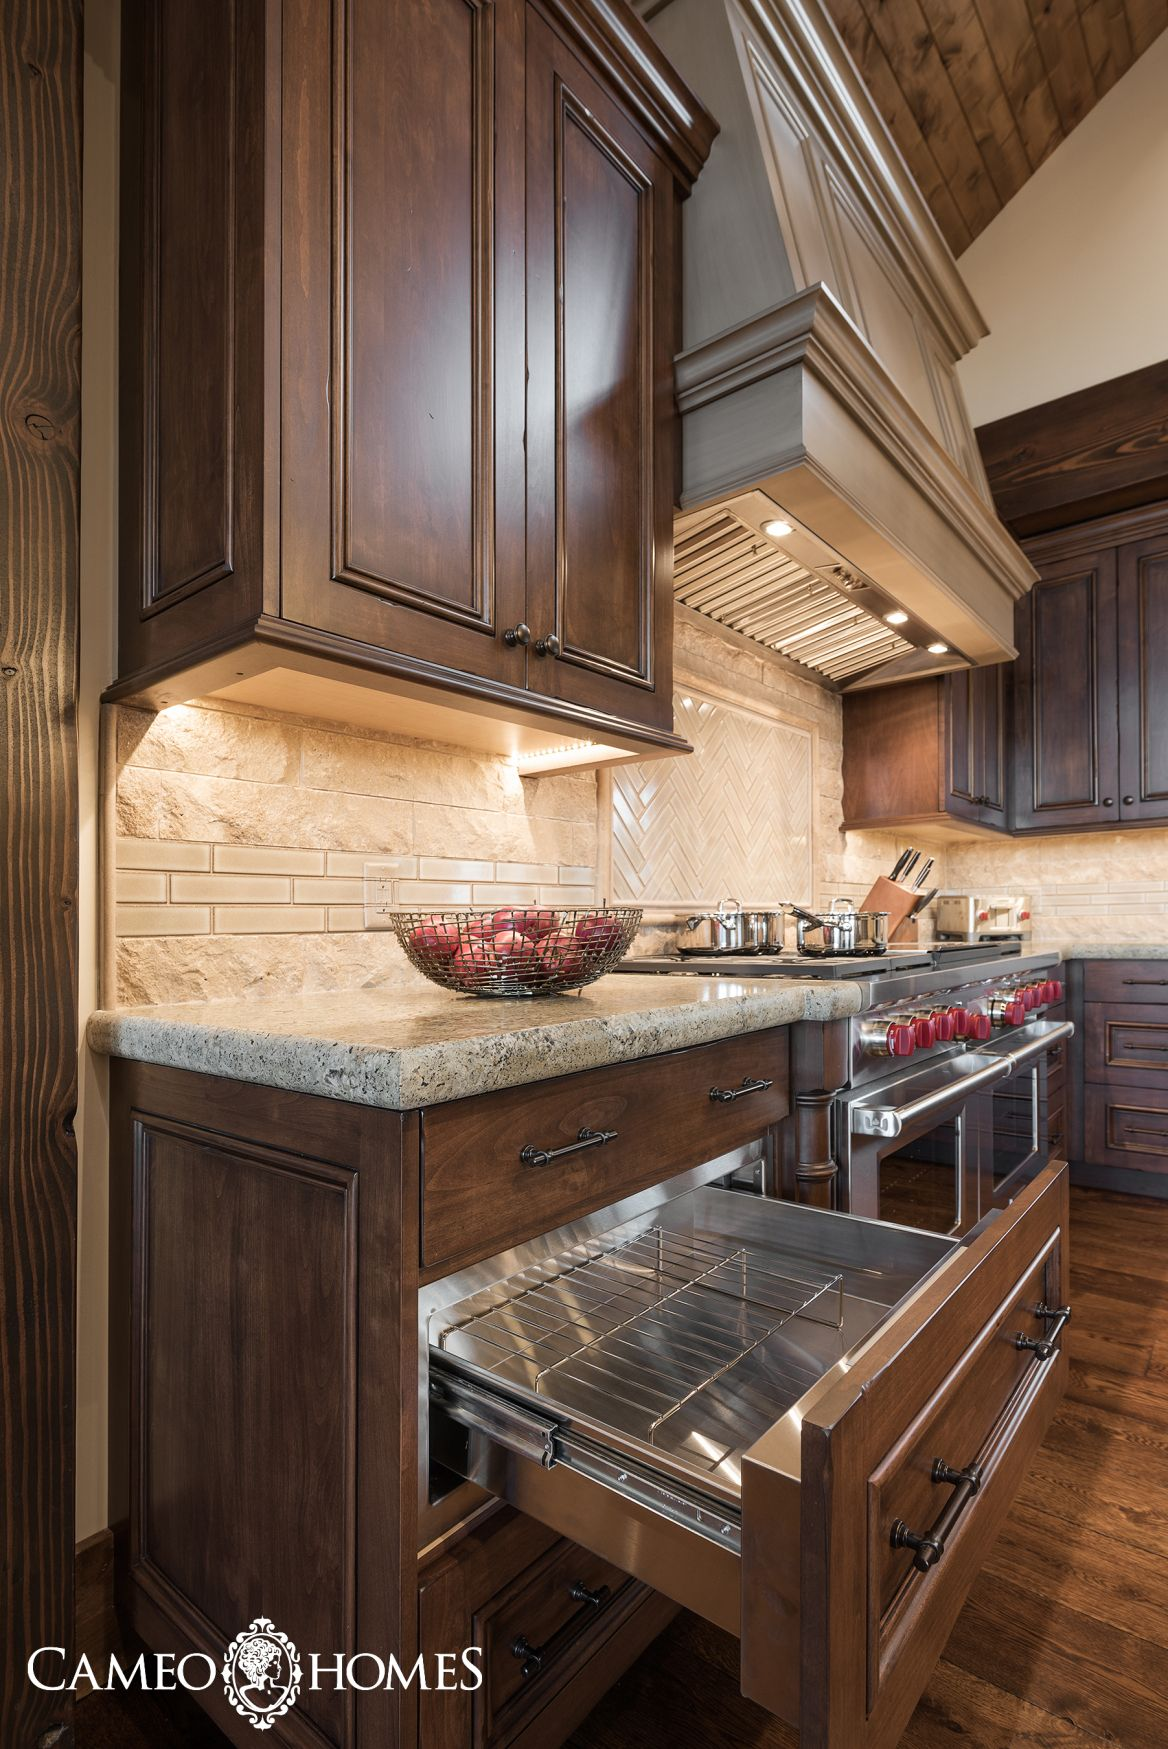 _llc9470_web_watermarked | Kitchen inspirations, Rustic ...